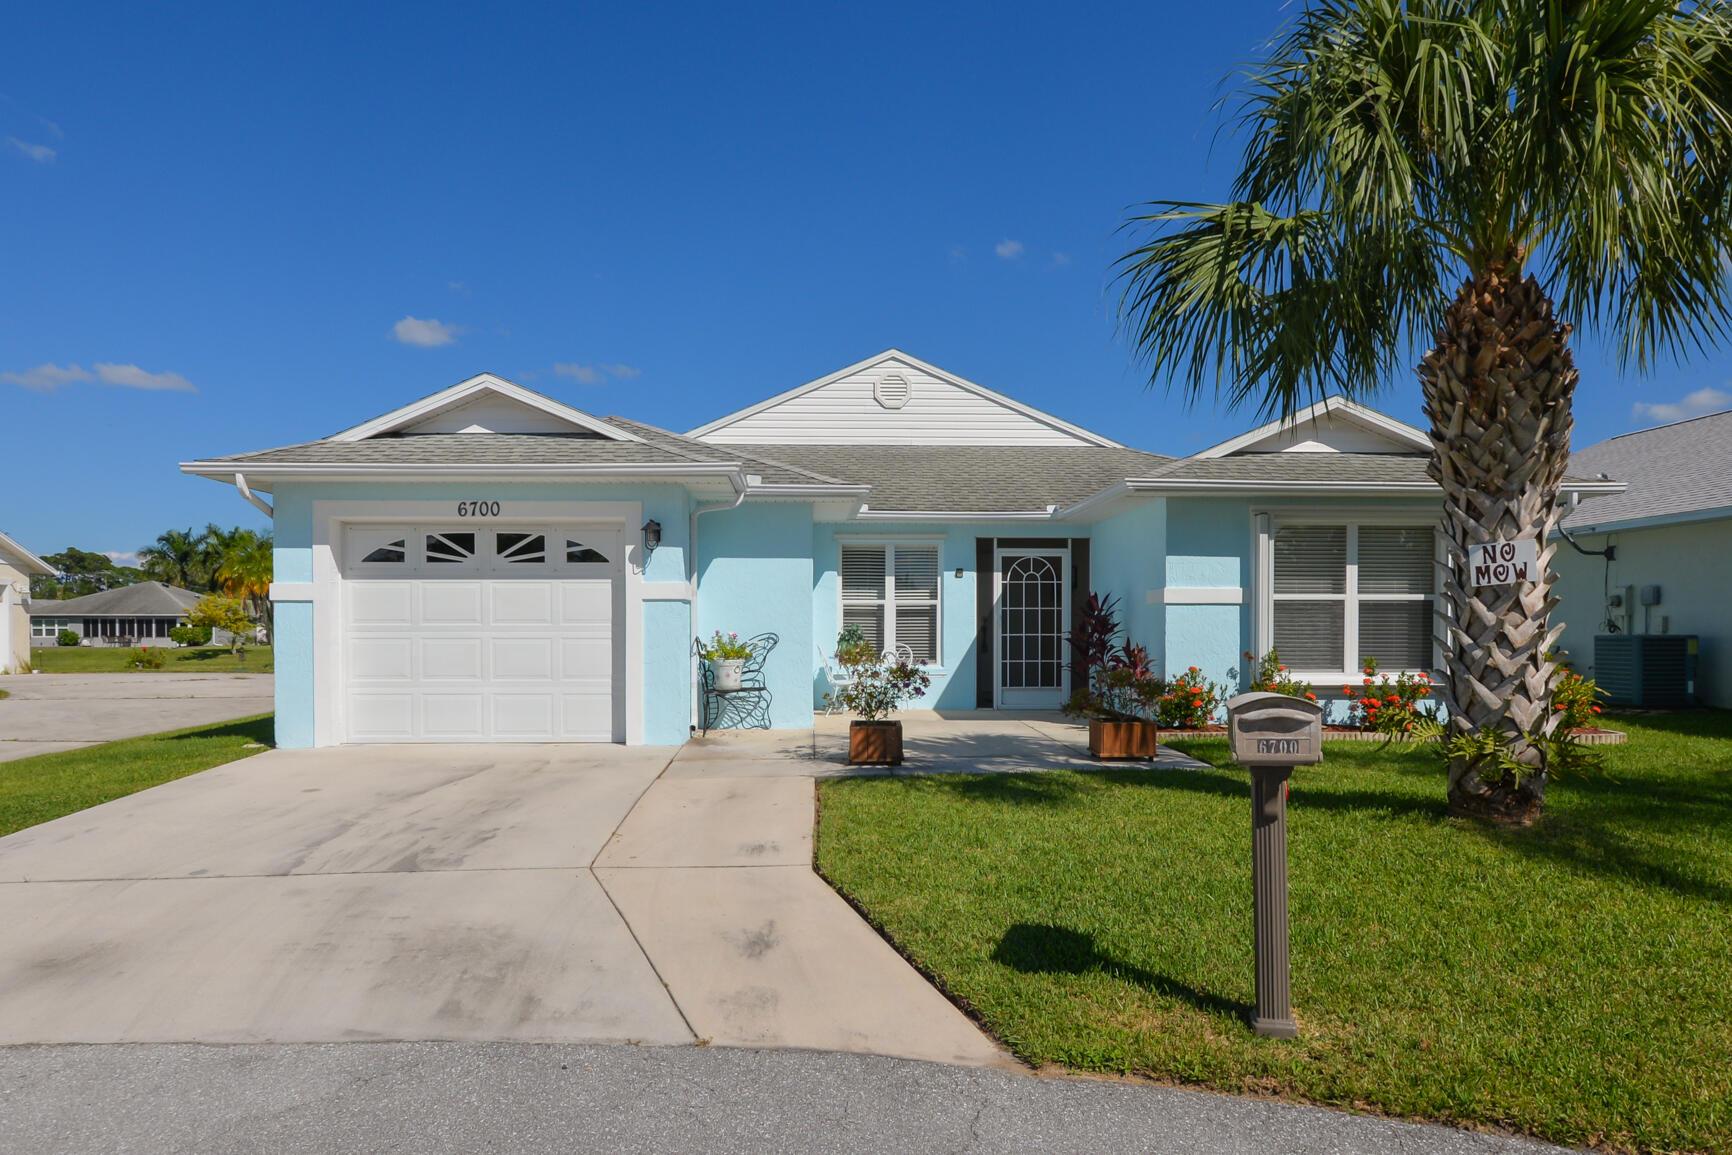 6700 Alheli, Fort Pierce, FL 34951